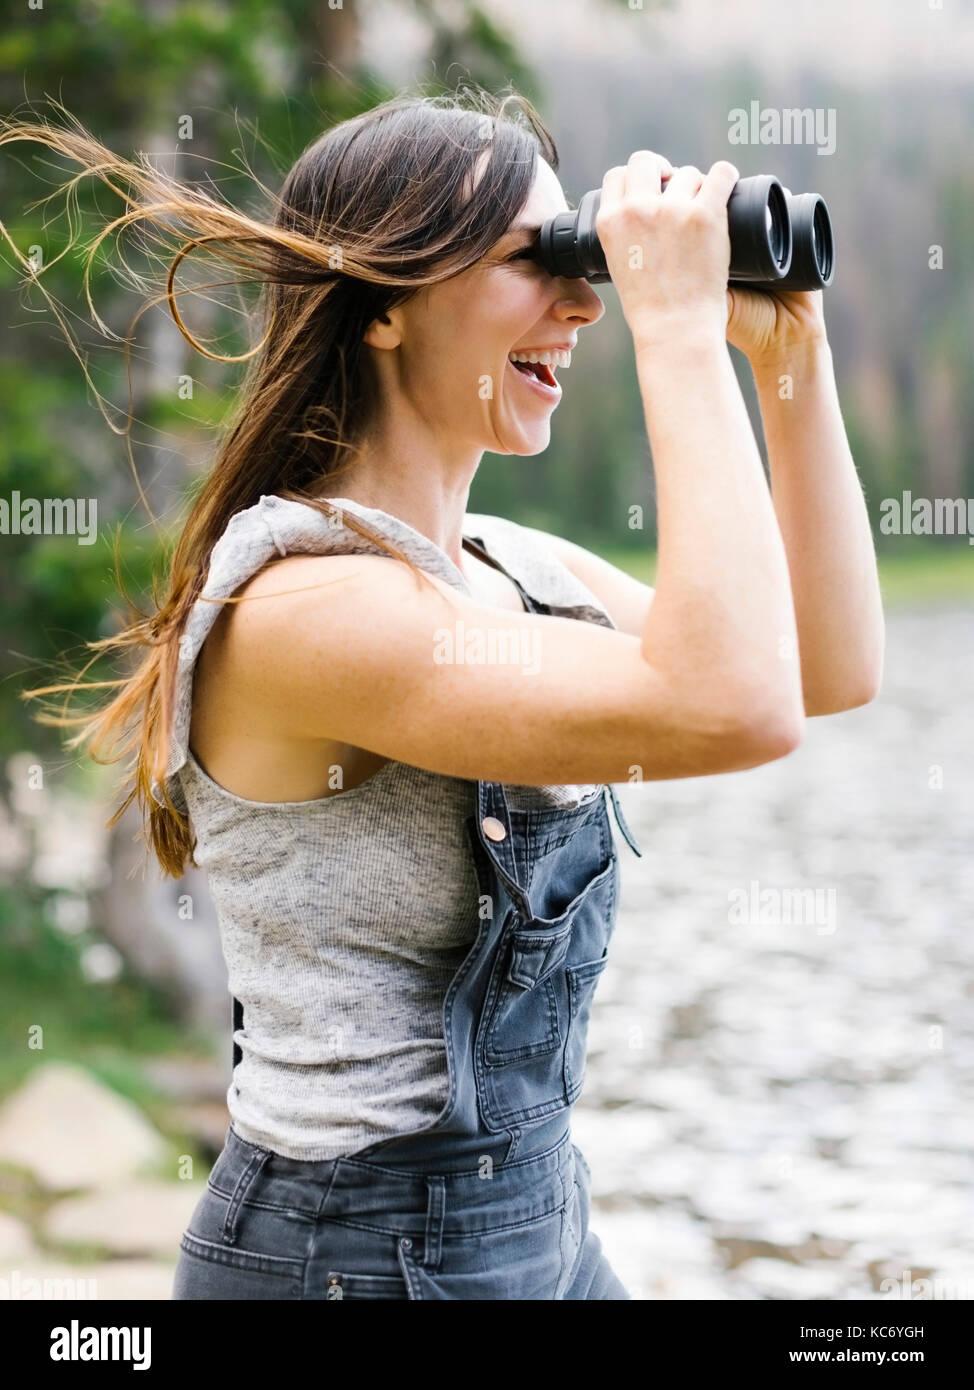 Woman using binoculars - Stock Image